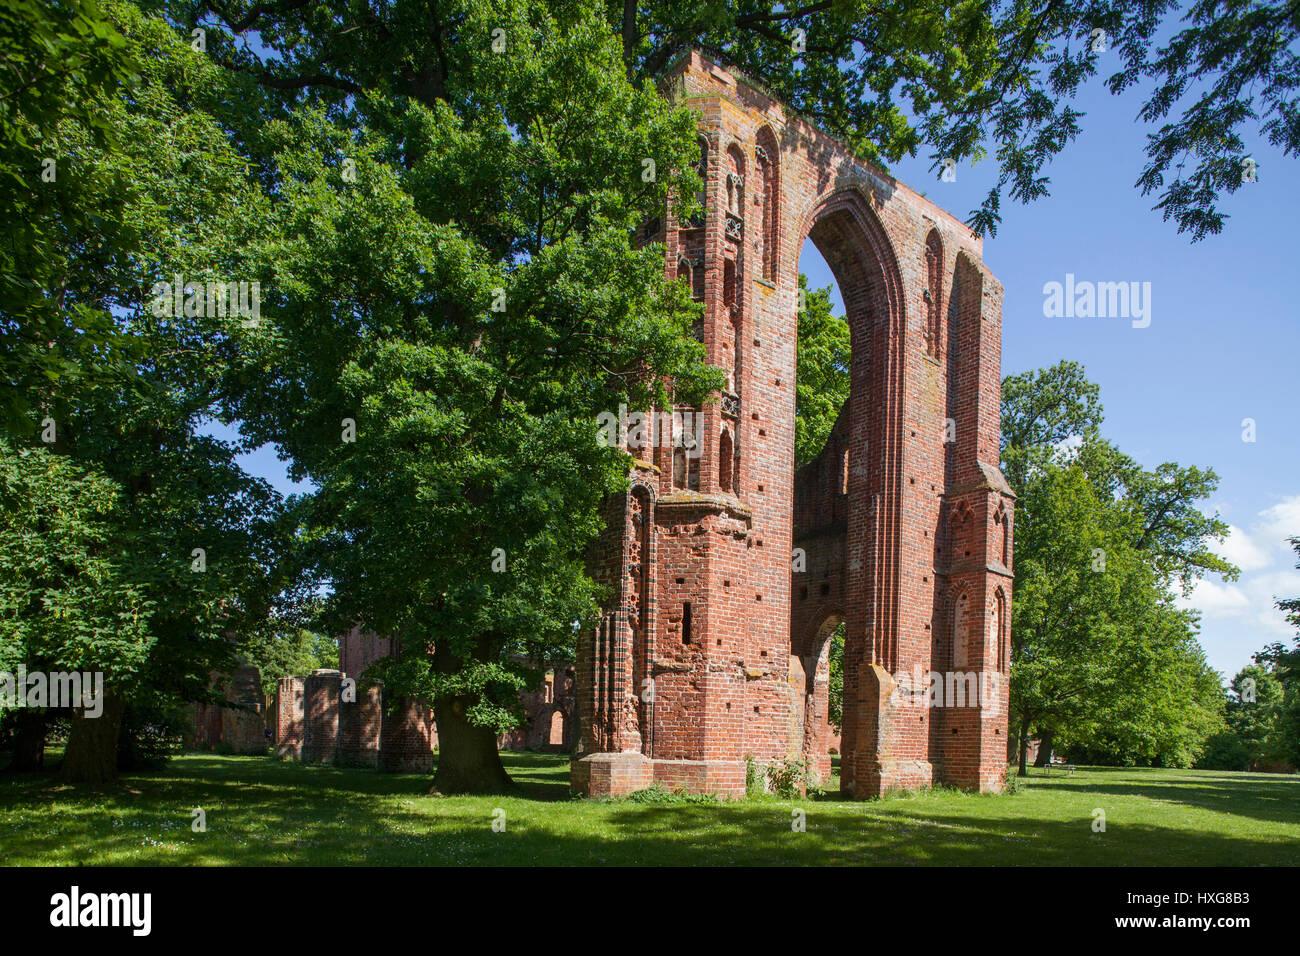 Kloster Mecklenburg Vorpommern